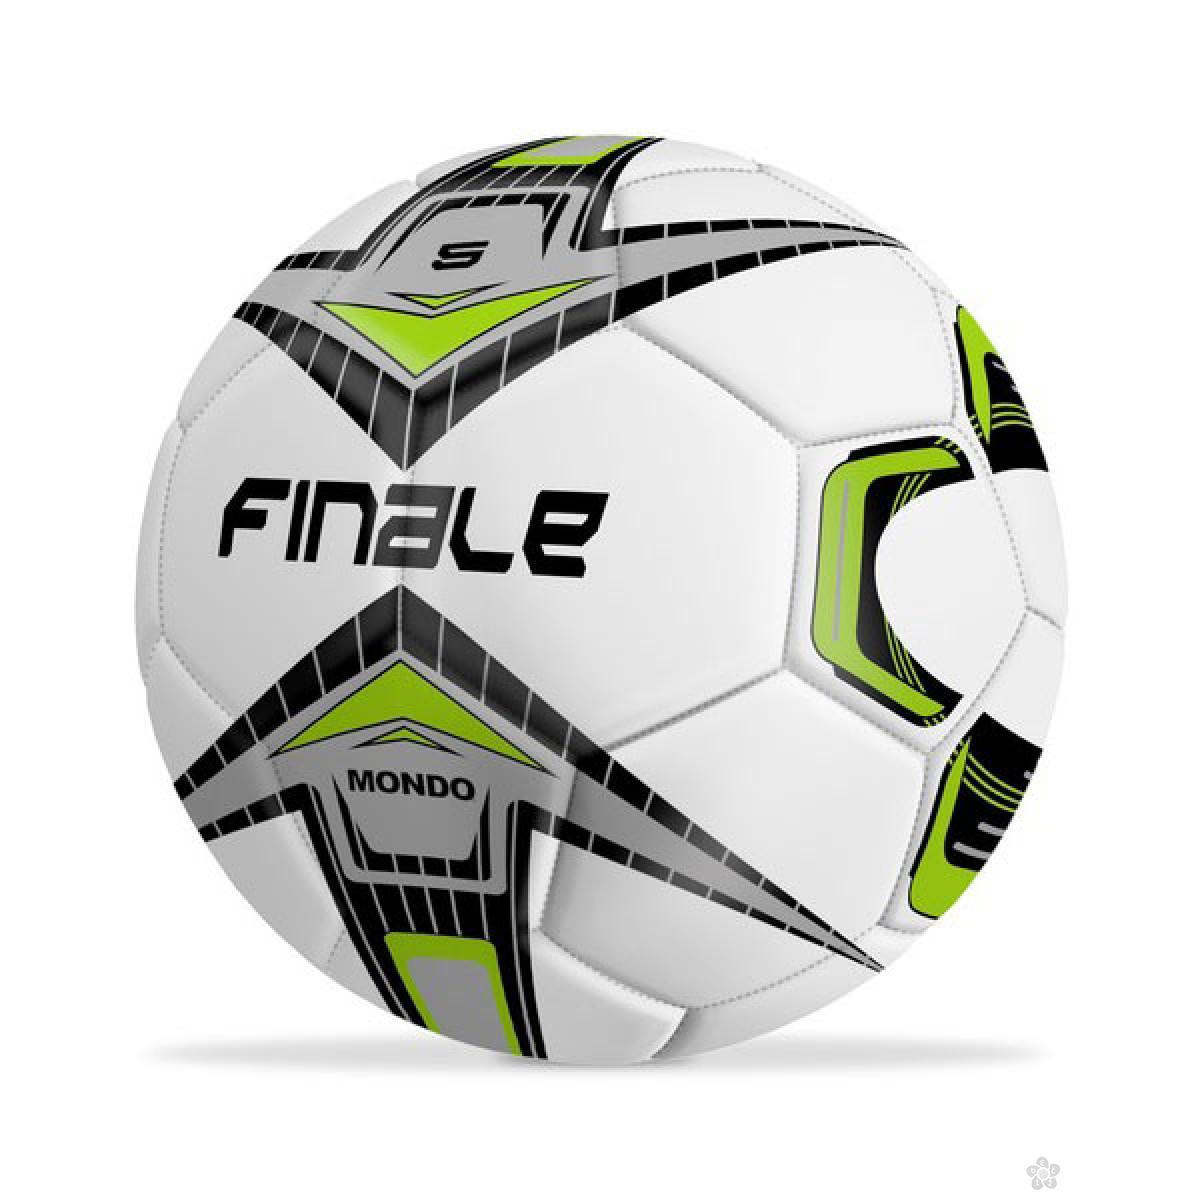 Lopta fudbal finale zelena 13595